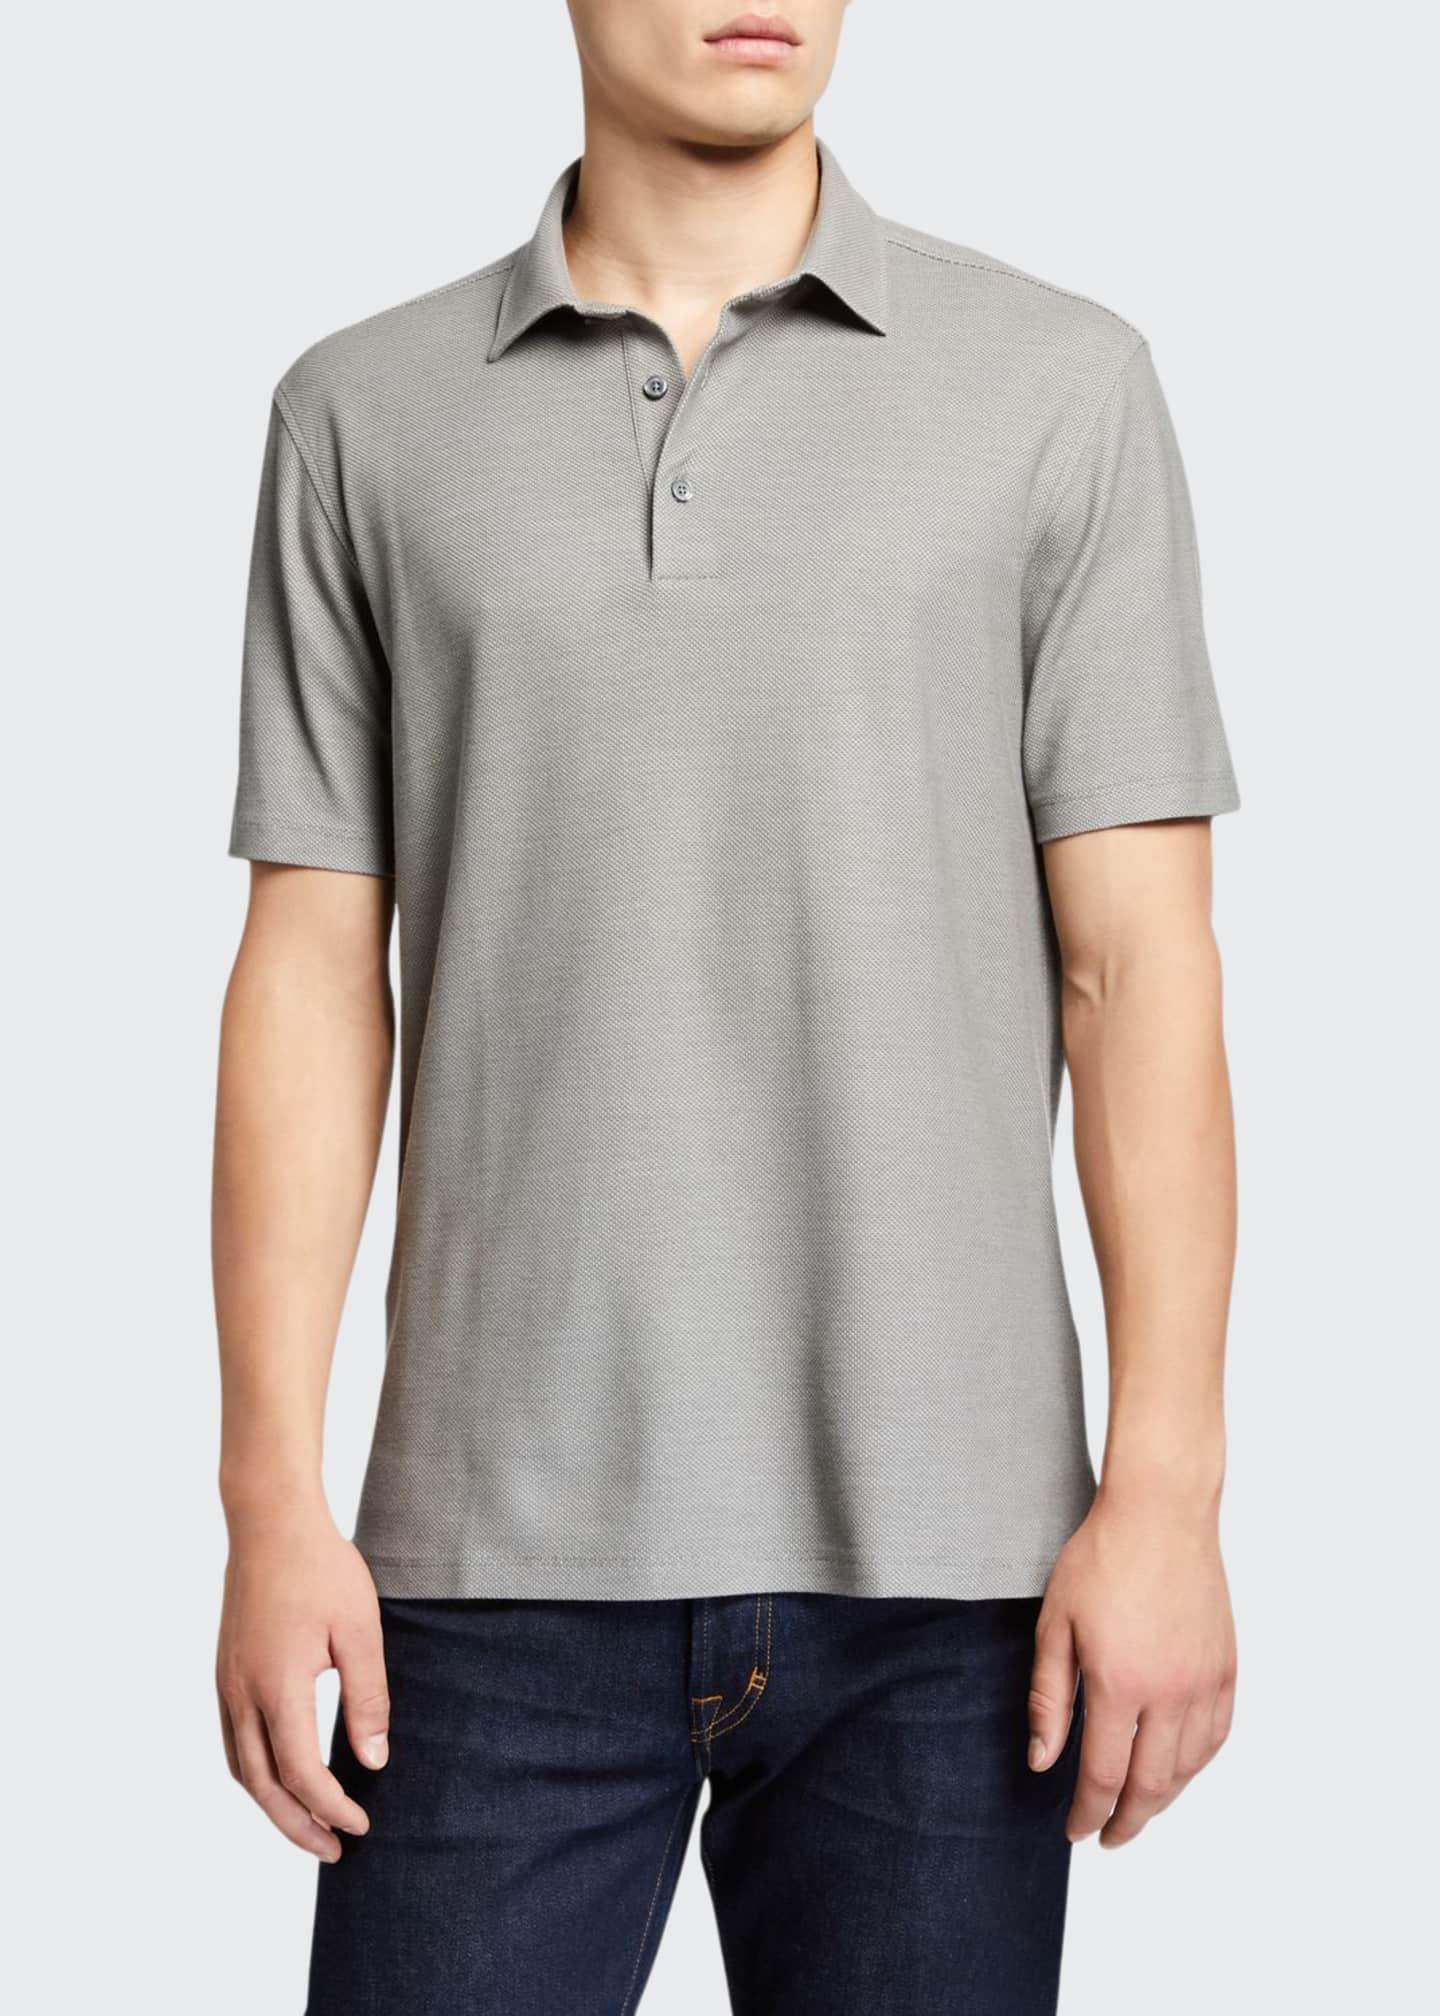 Ermenegildo Zegna Men's Solid Birdseye Cotton-Silk Polo Shirt